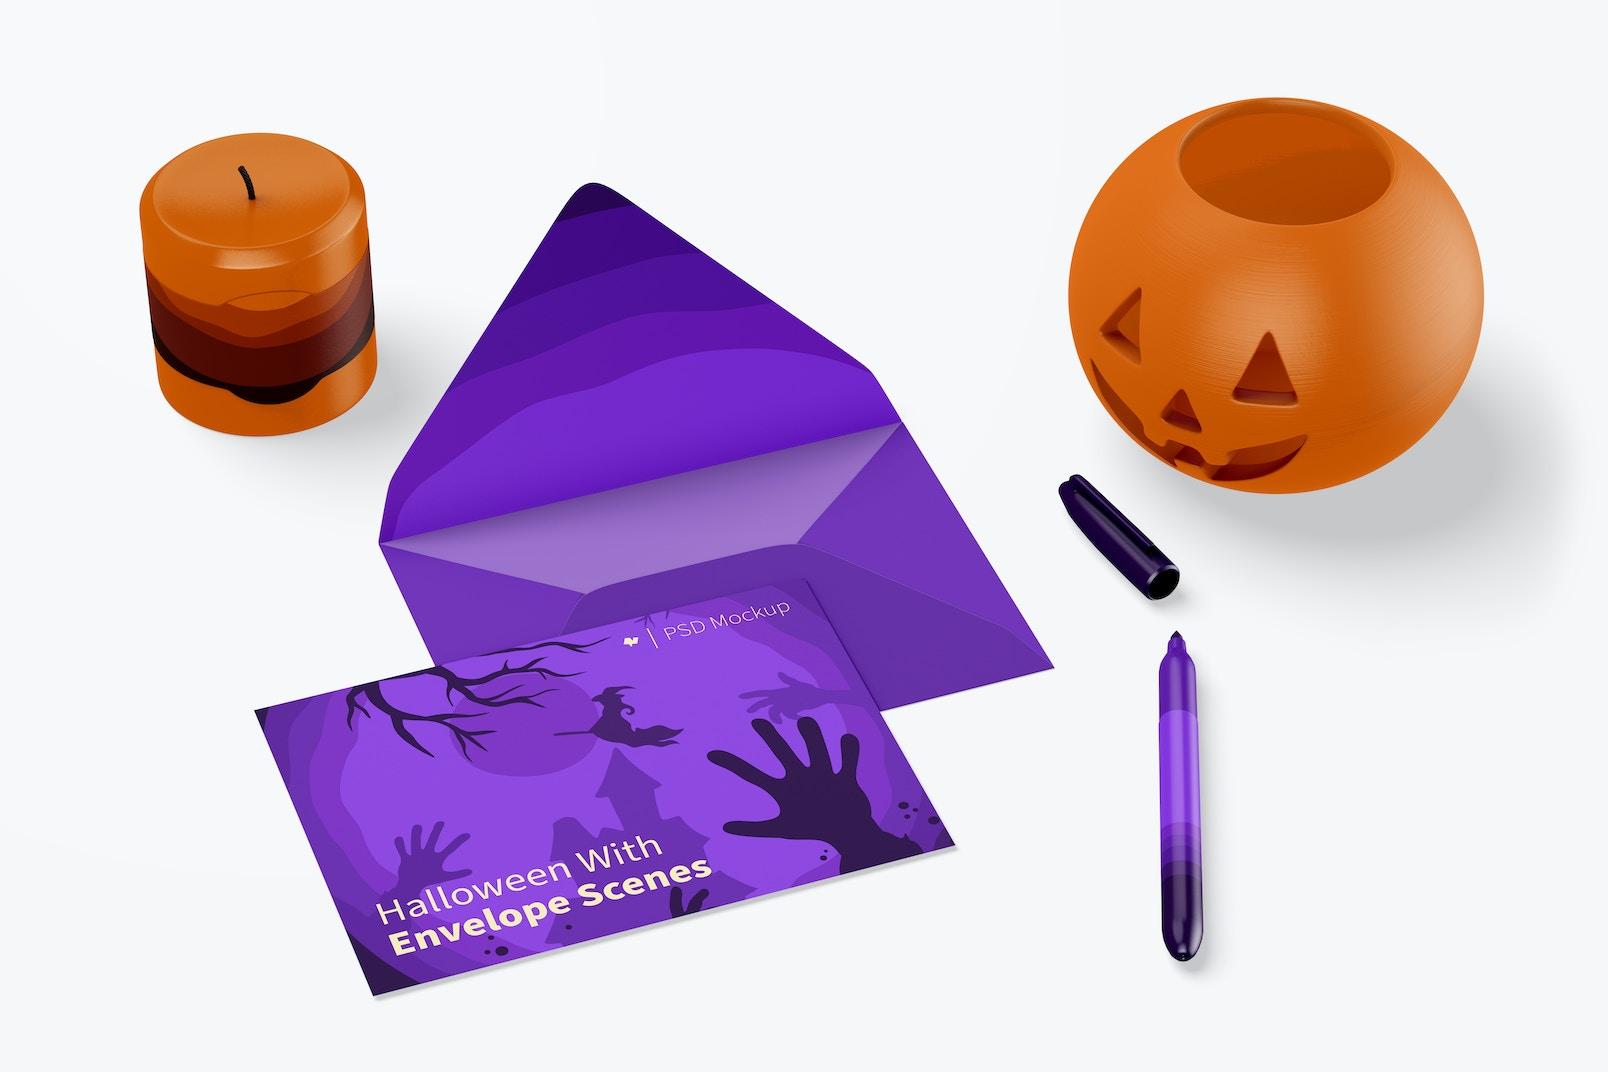 Halloween with Envelope Scene Mockup, Top View